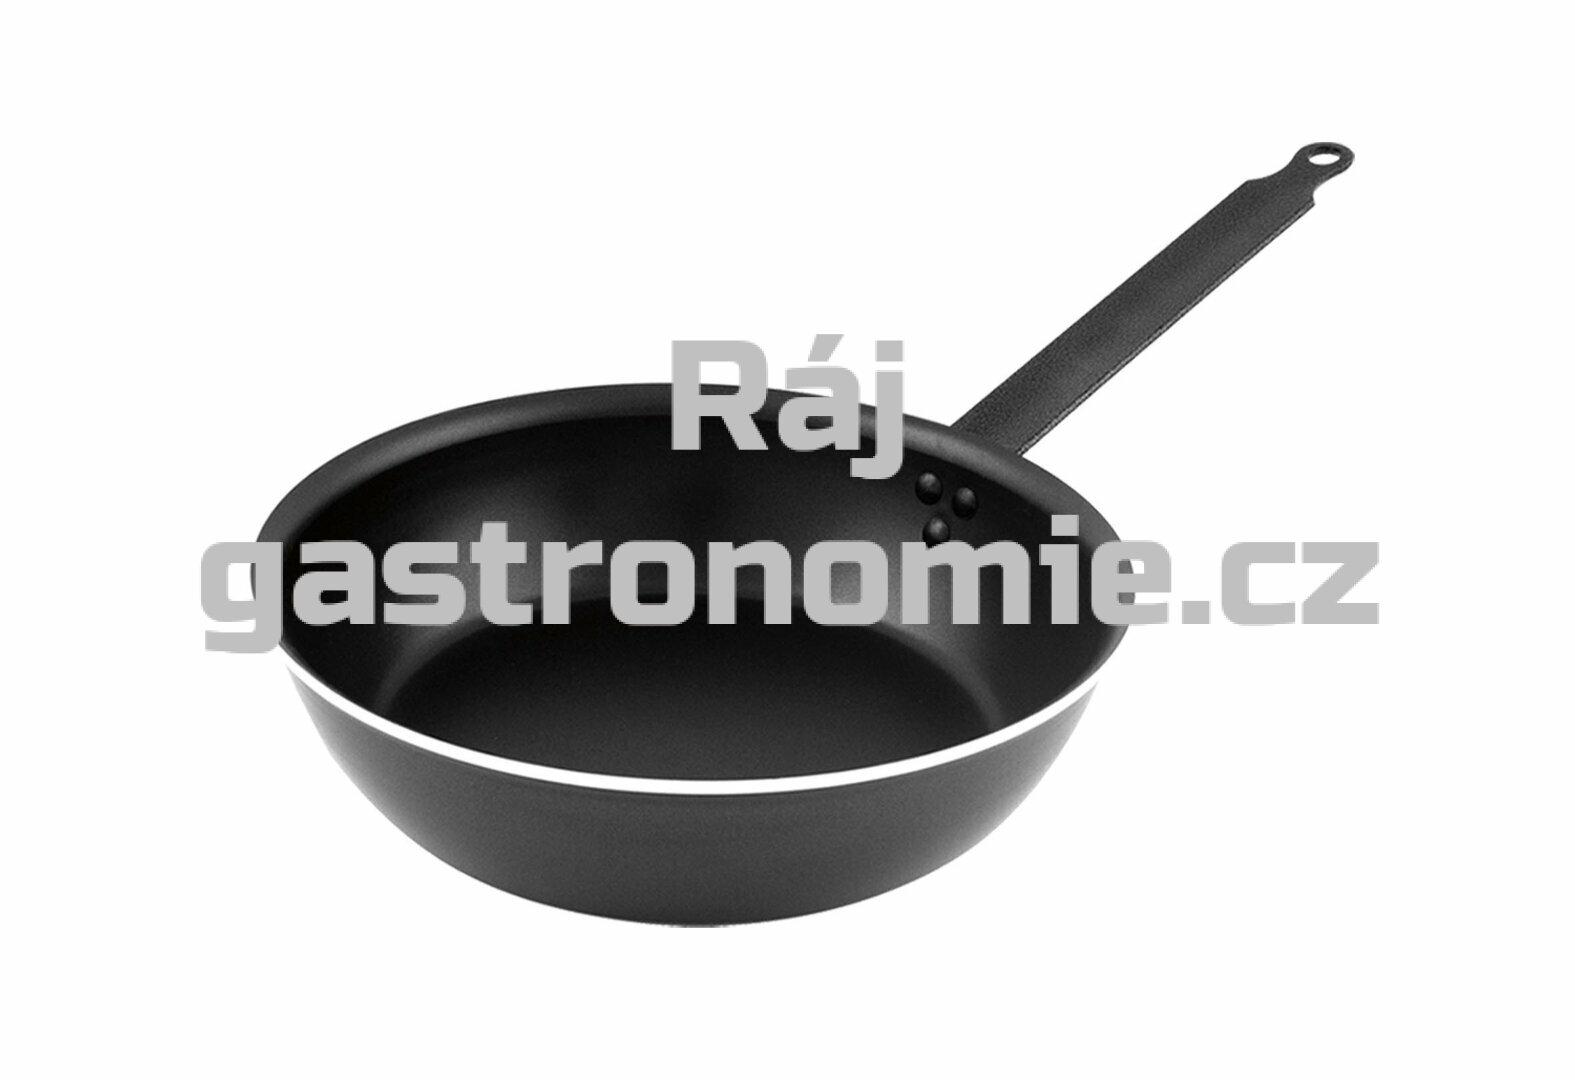 Pánev Al/Teflon na soté (Ø320 mm, hmotnost 2kg)